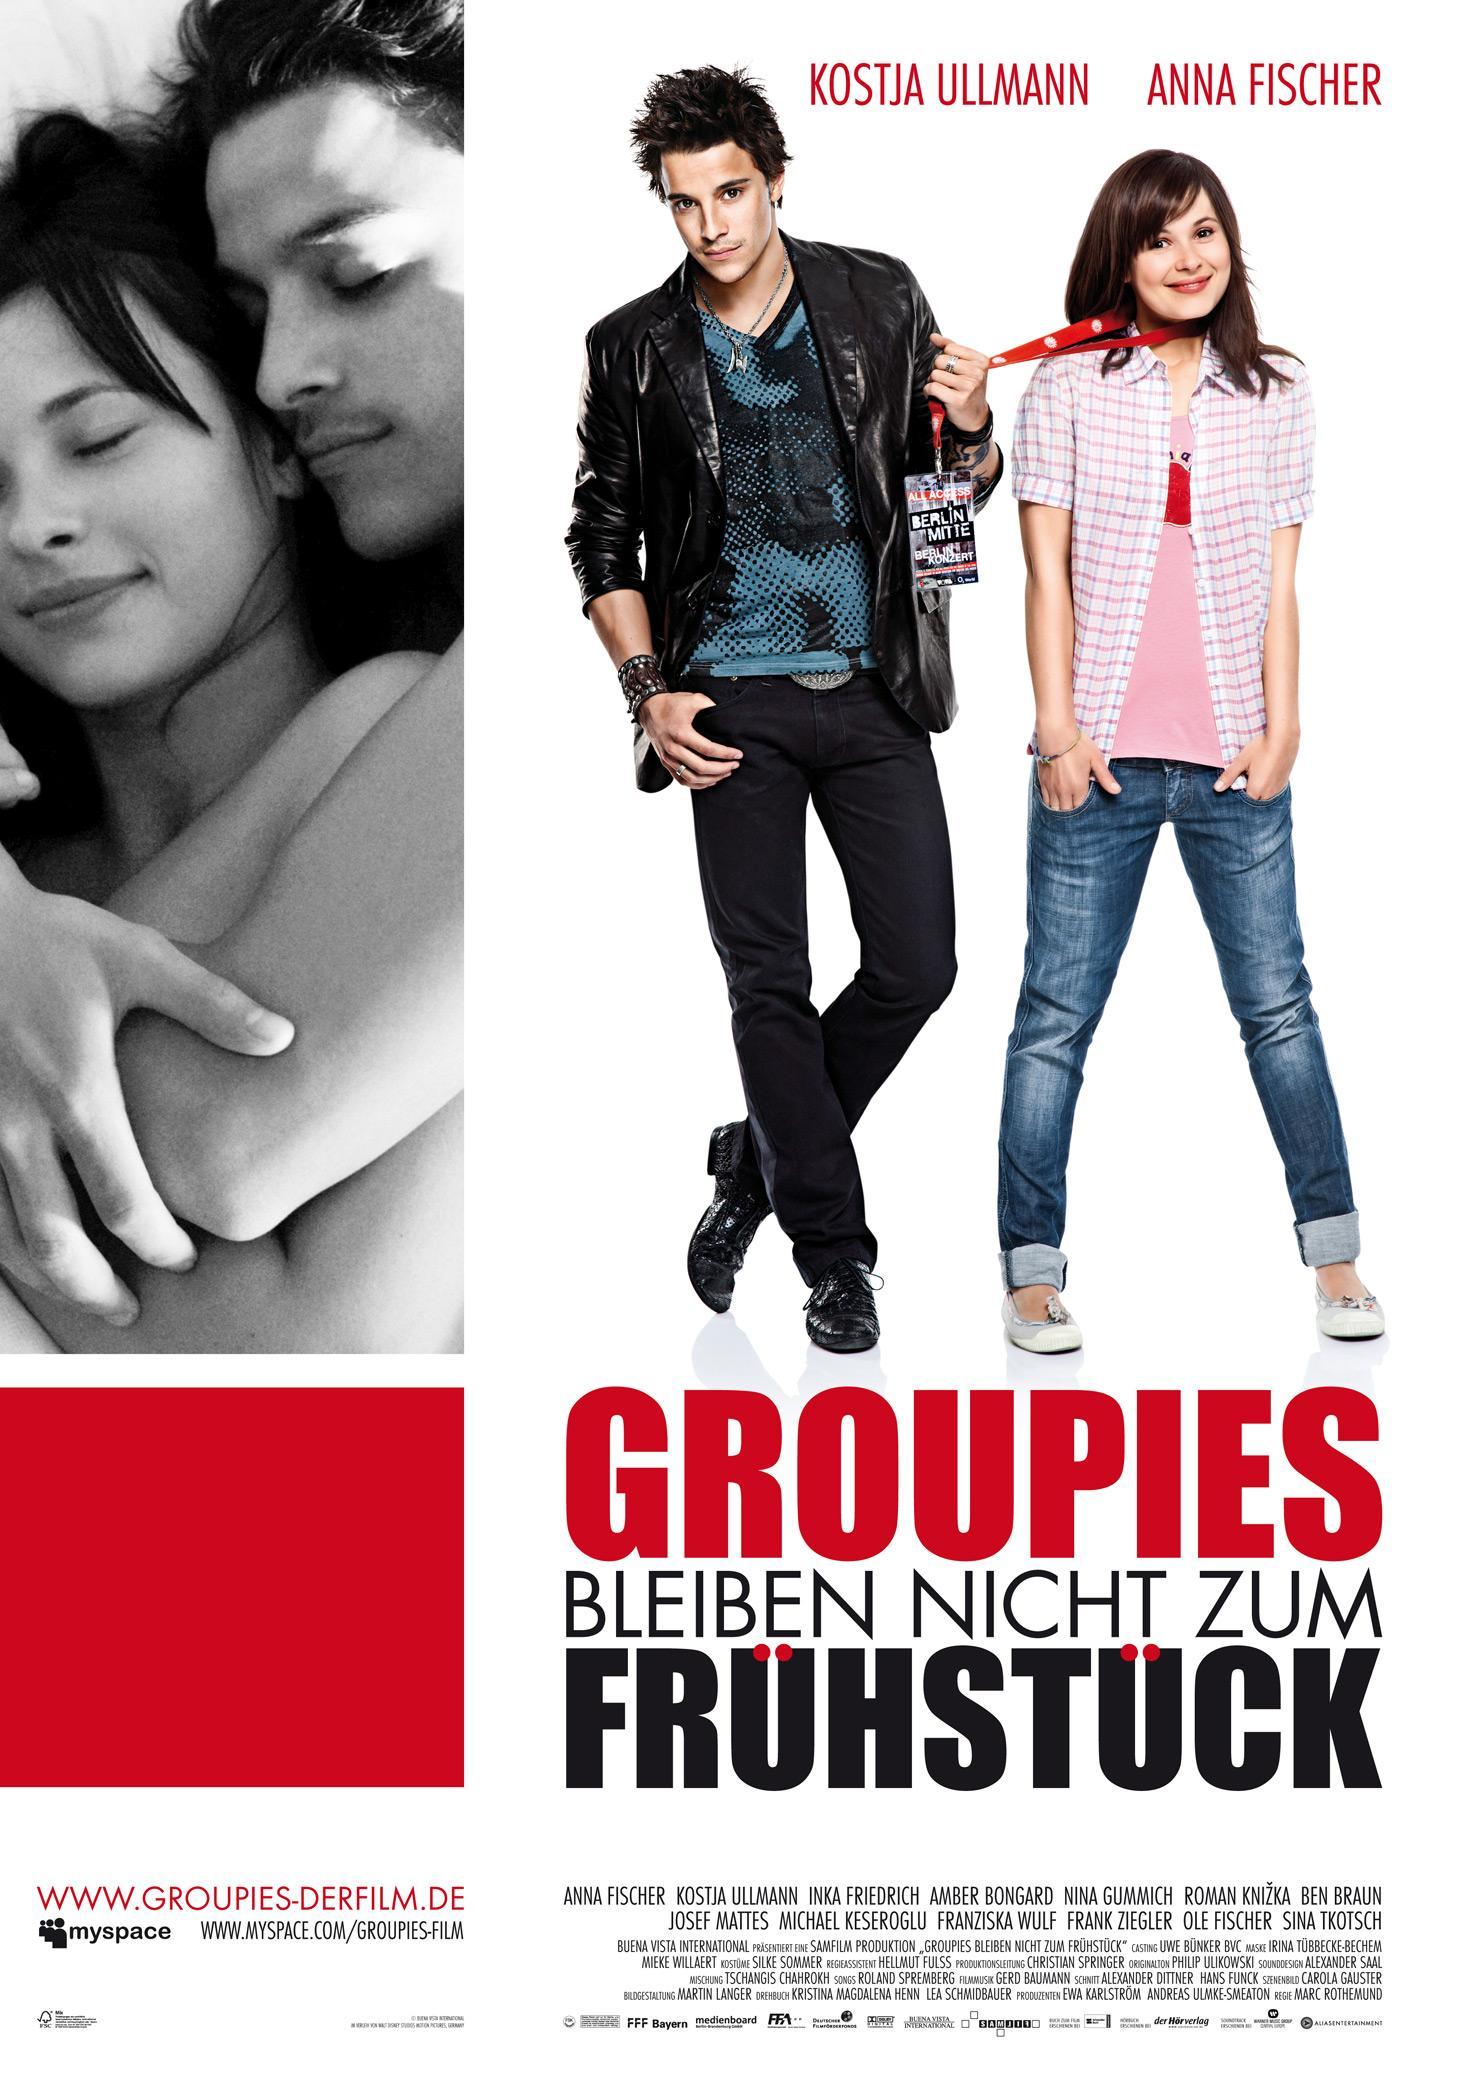 Groupies bleiben nicht zum Frühstück (Poster)